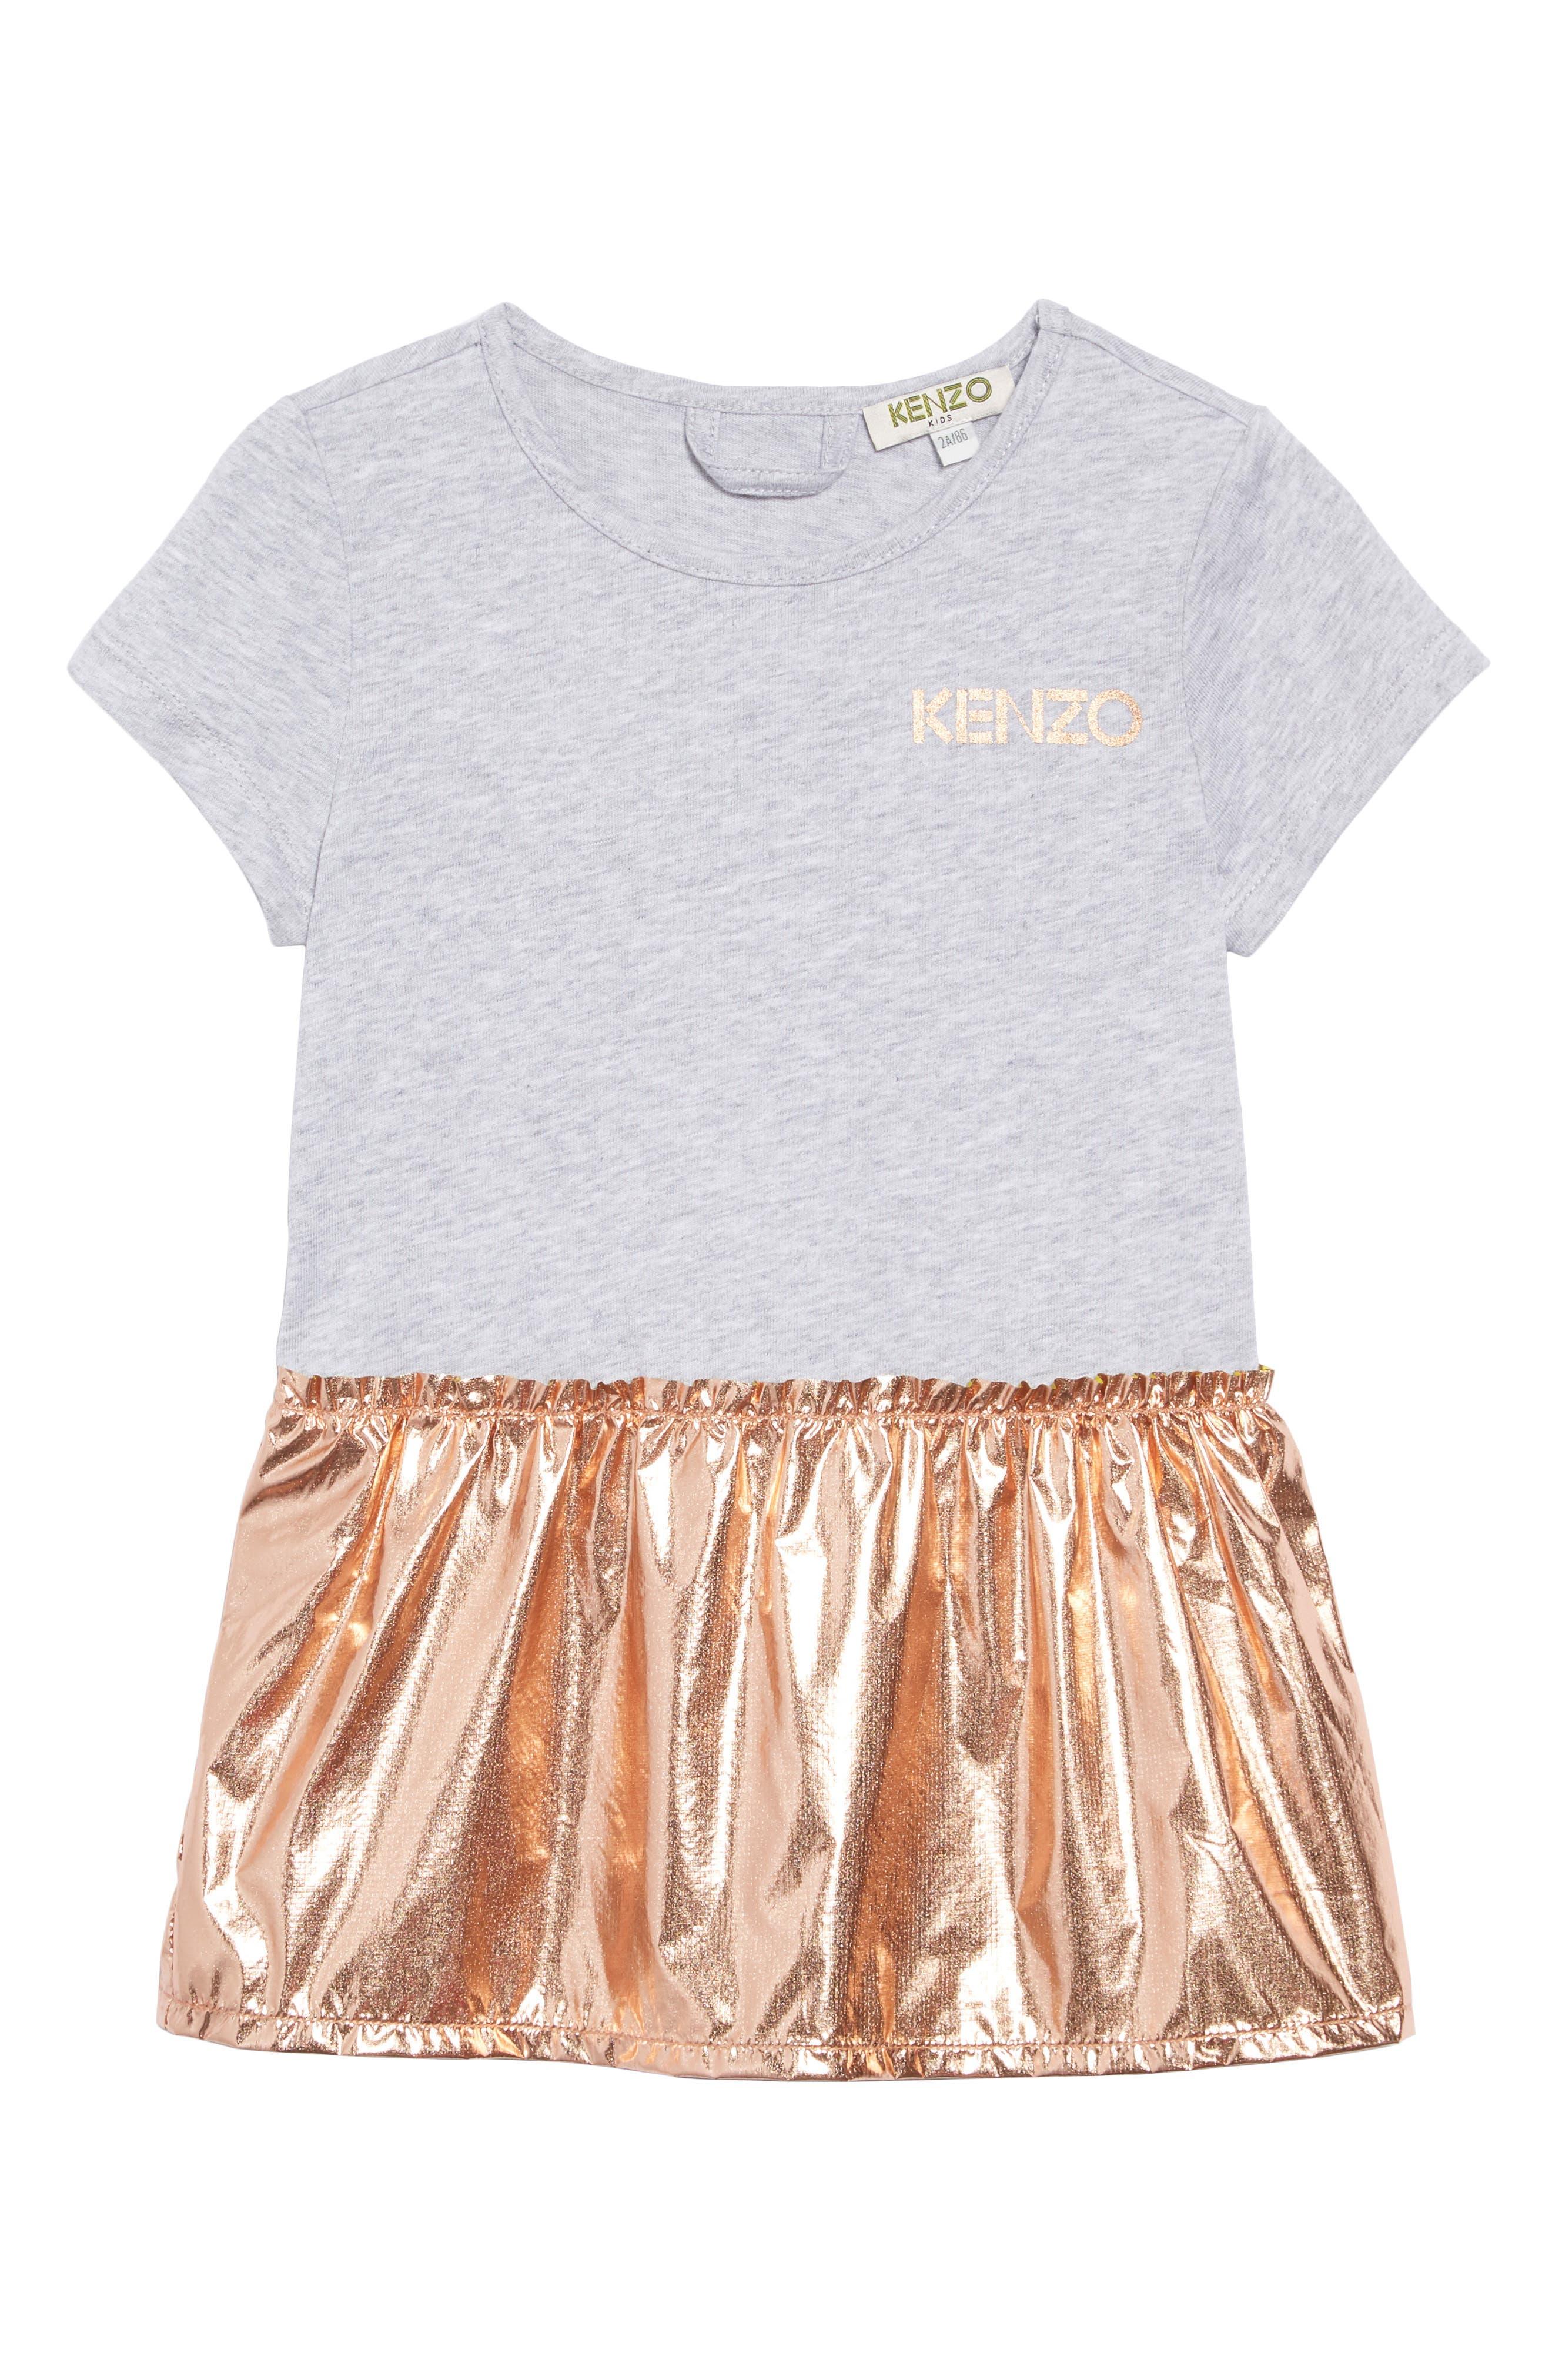 KENZO, Metallic Graphic Sweatshirt & Dress Set, Alternate thumbnail 3, color, COPPER